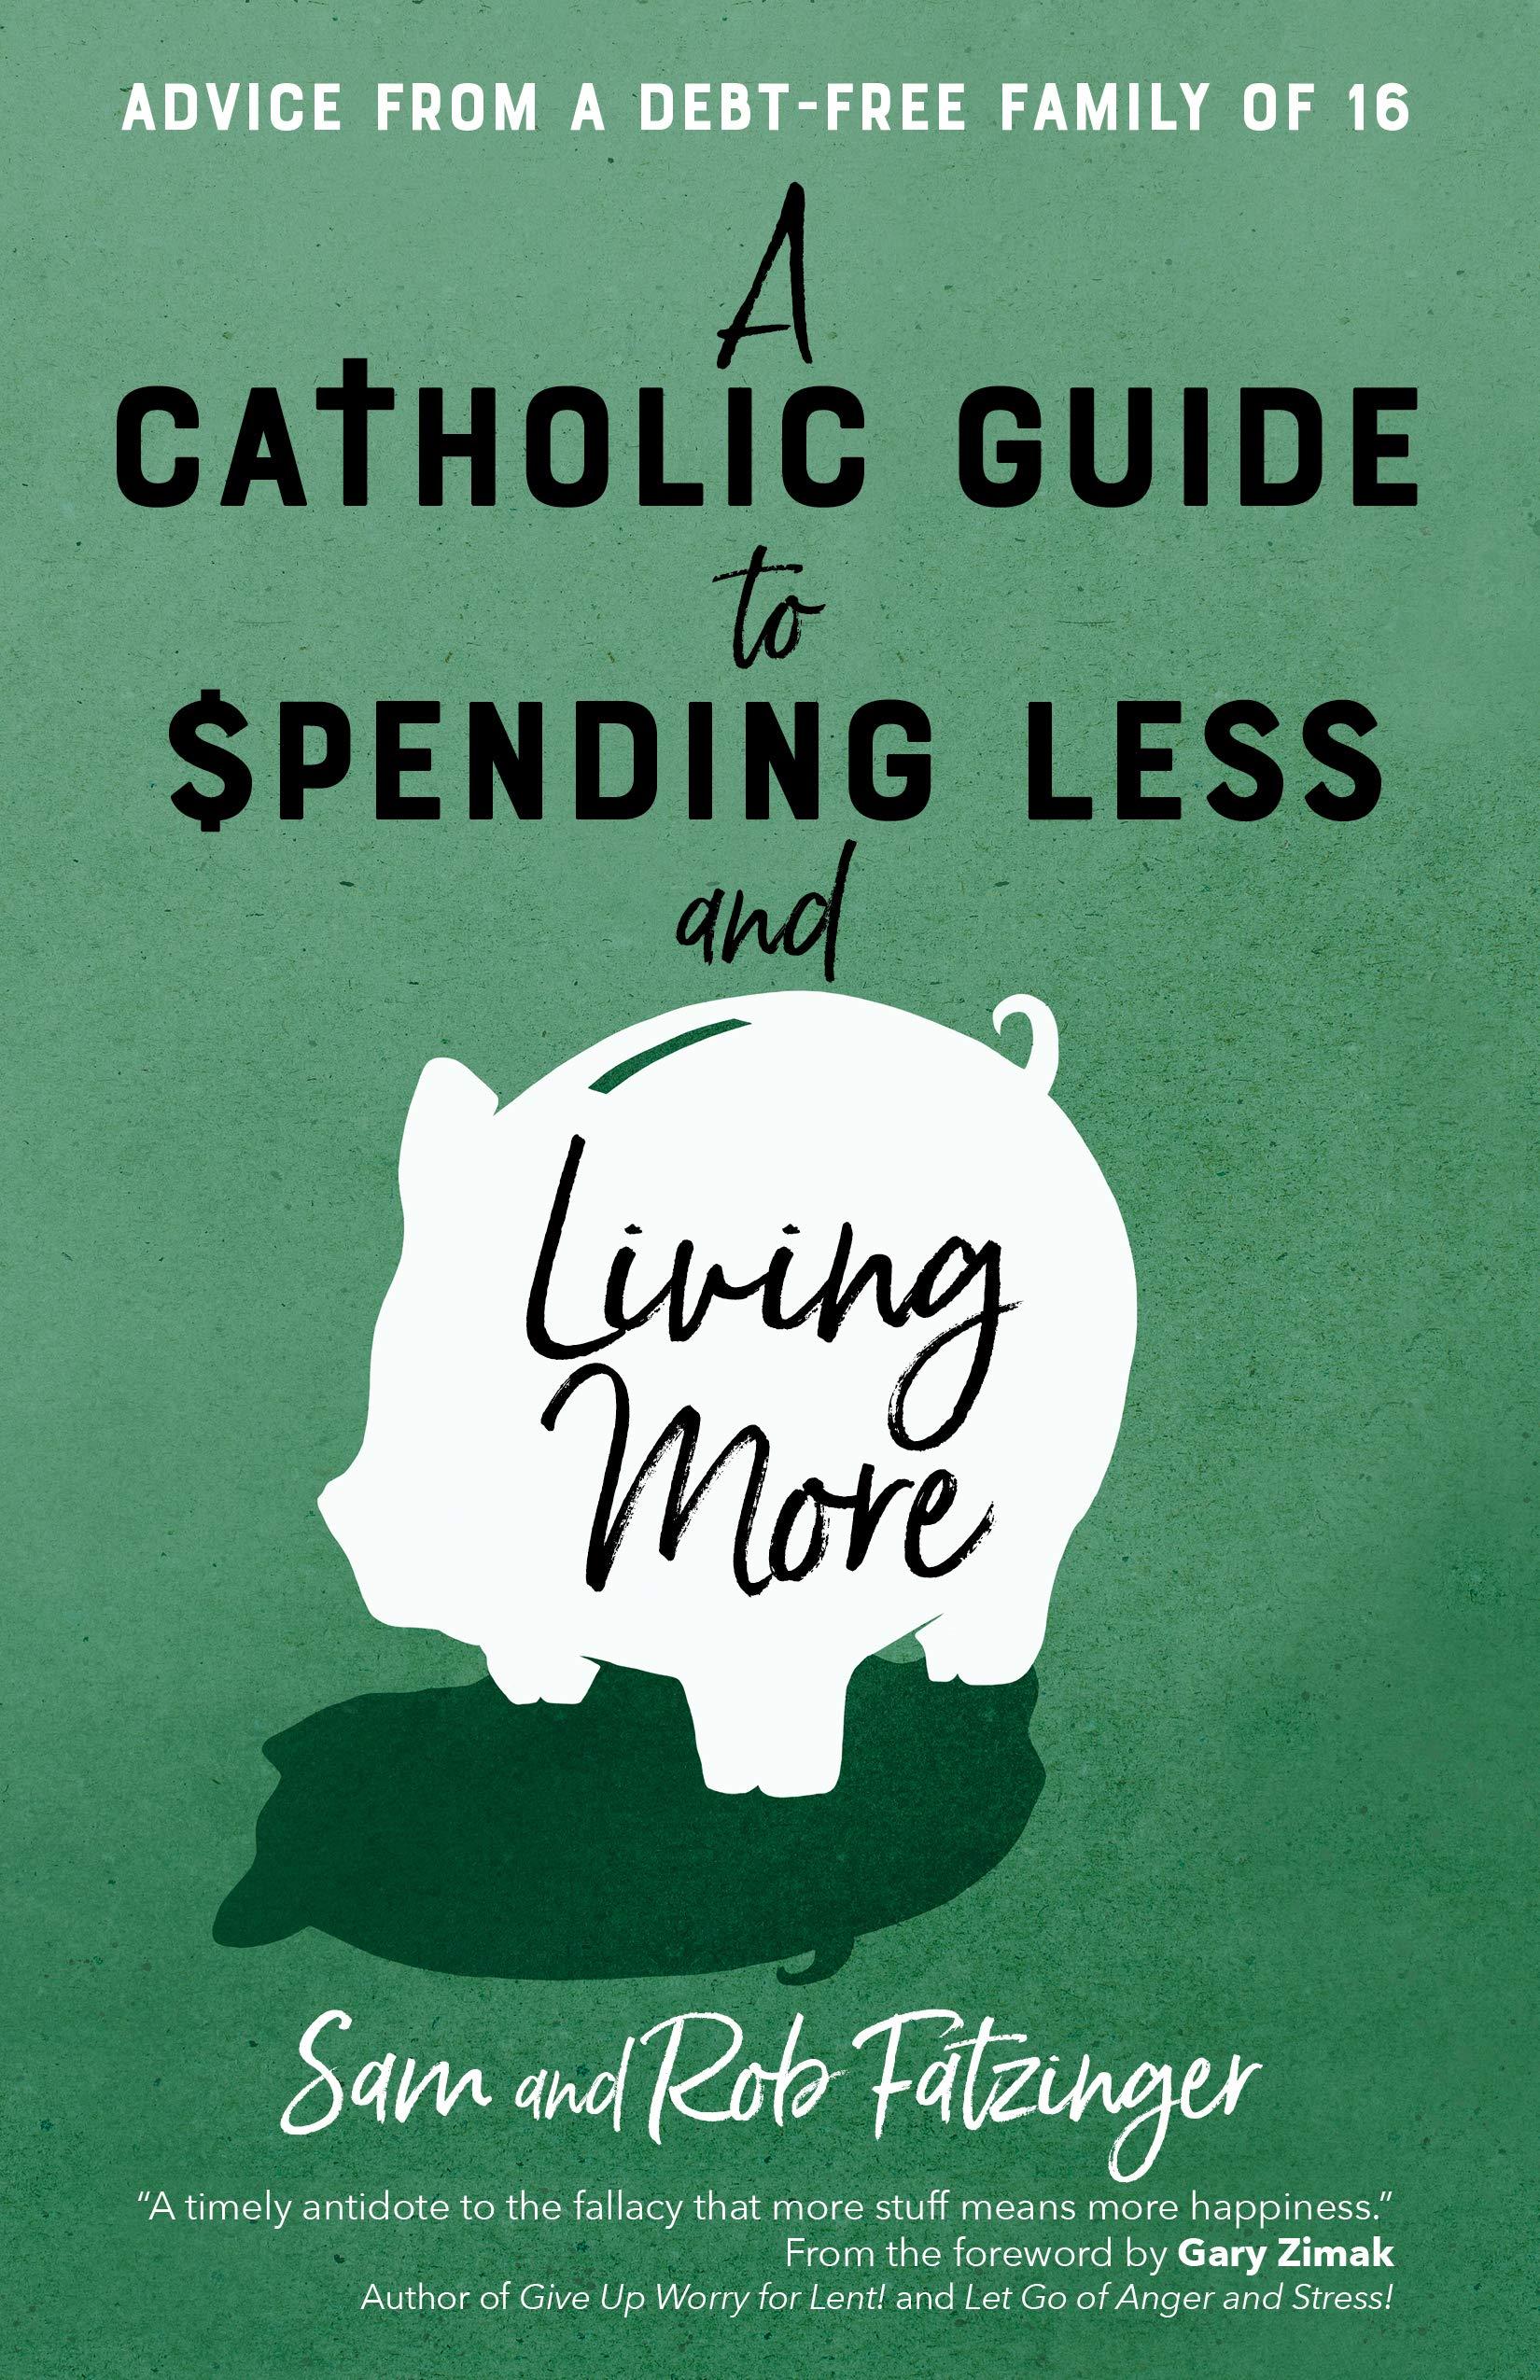 Amazon.com: A Catholic Guide to Spending Less and Living More: Advice from  a Debt-Free Family of 16 (9781646800476): Fatzinger, Sam, Fatzinger, Rob,  Zimak, Gary: Books